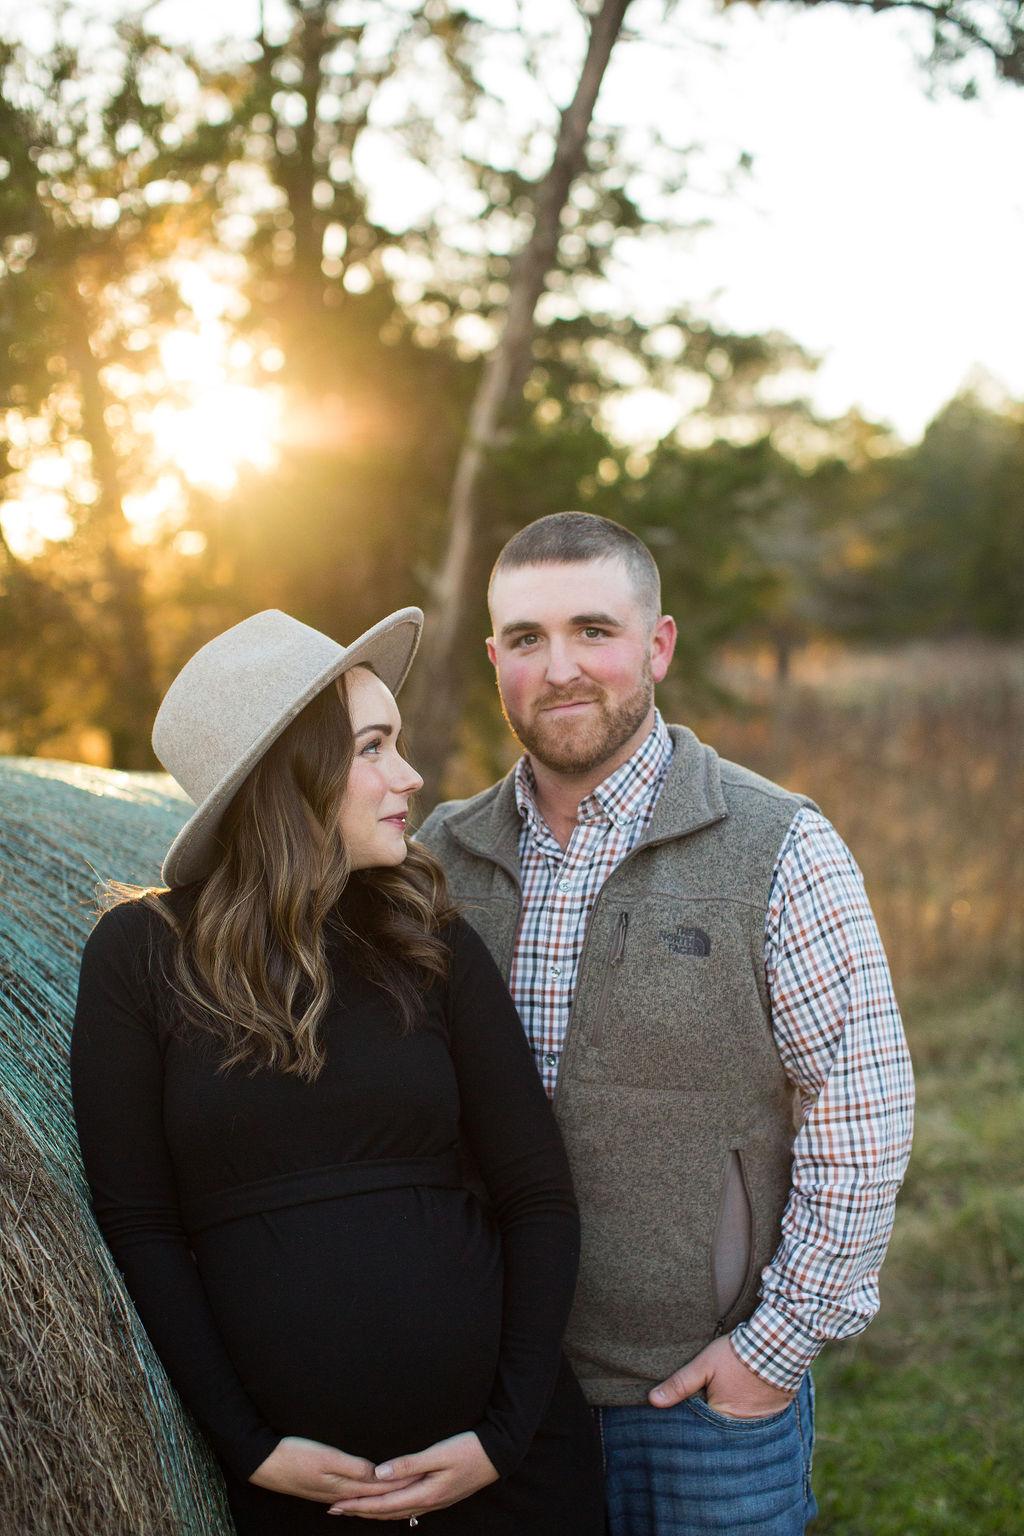 Nashville winter maternity session by Wendy Hardin Photography | Nashville Bride Guide